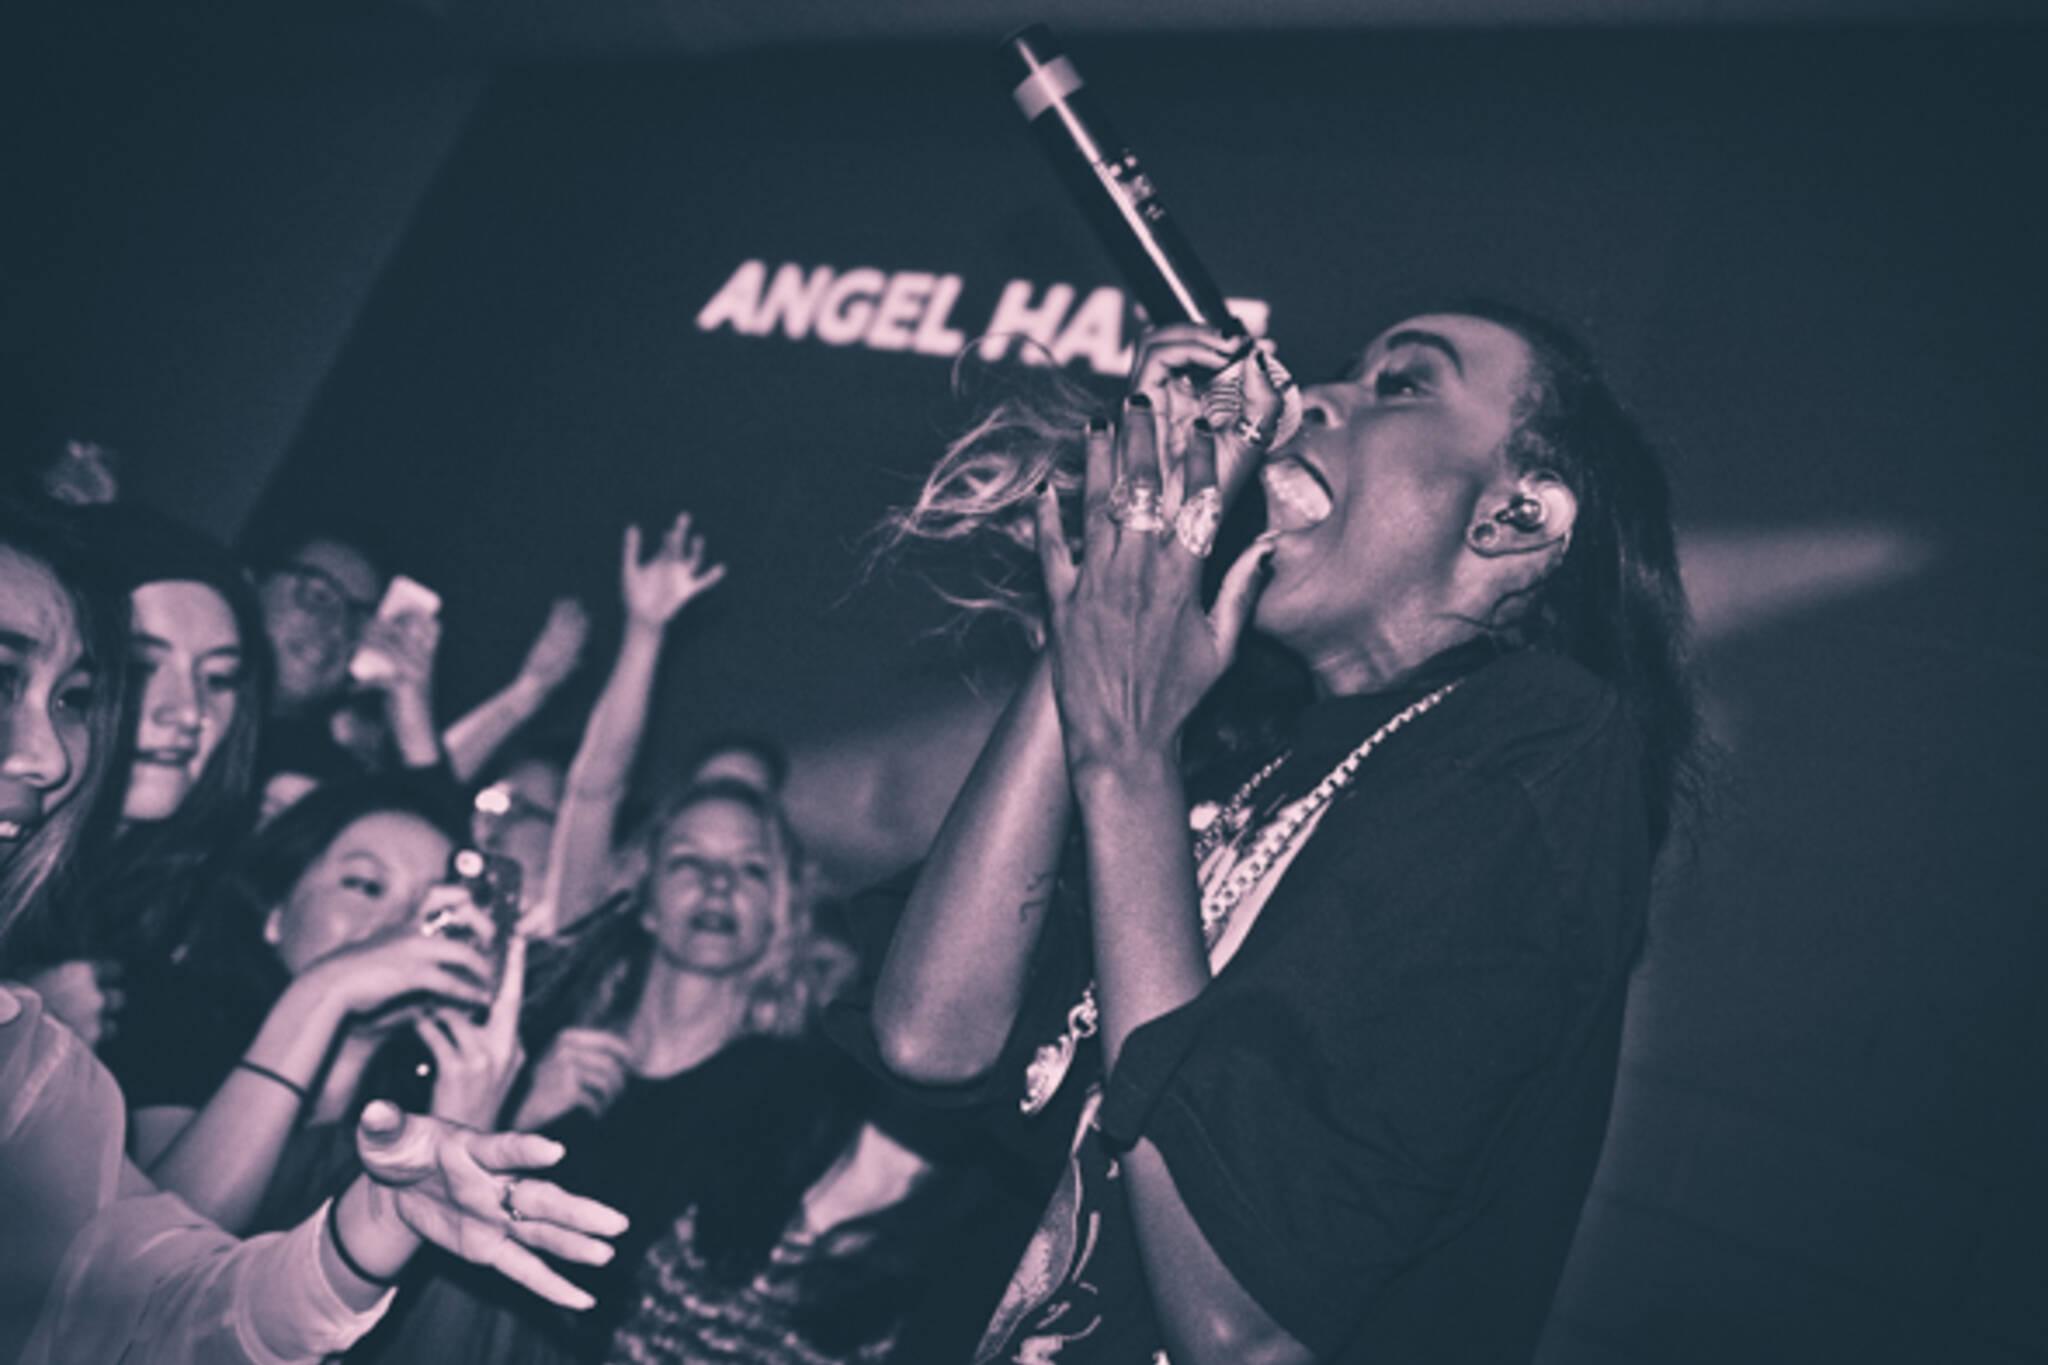 Angel Haze Toronto